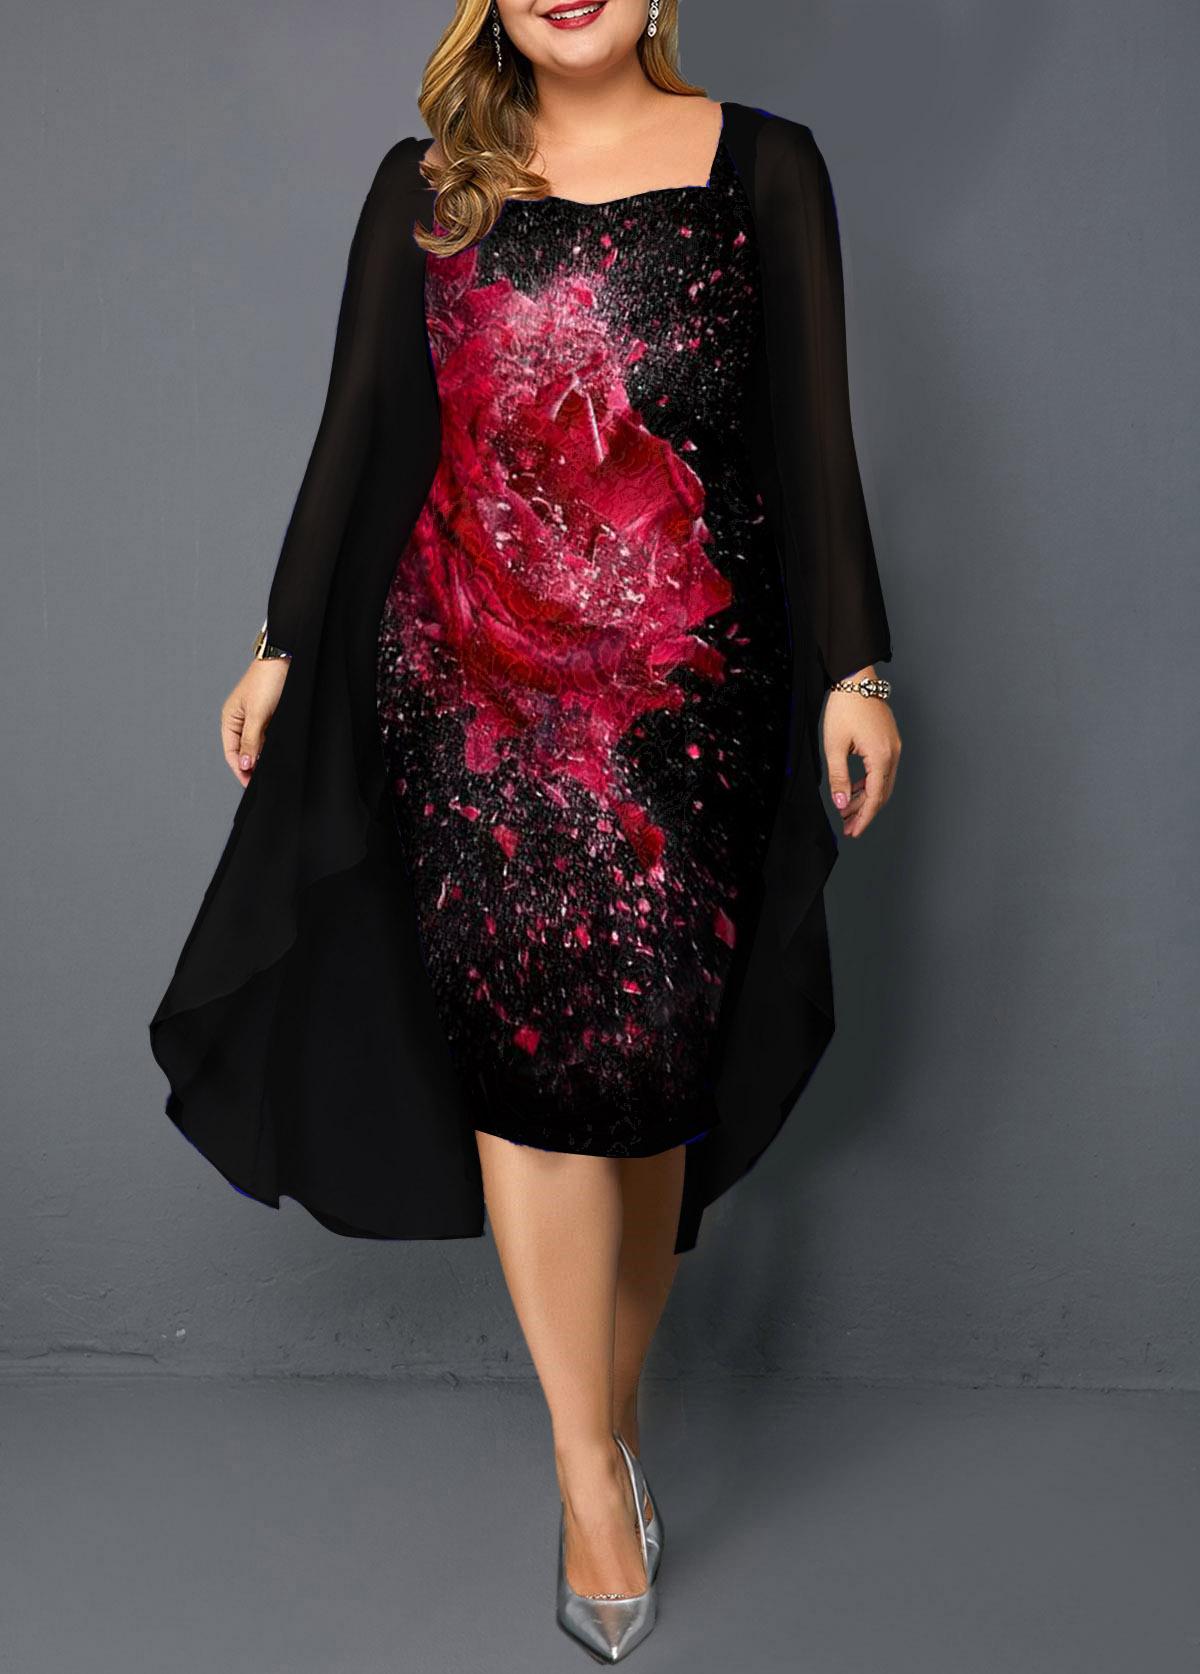 Plus Size Black Chiffon Cardigan and Flower Print Dress